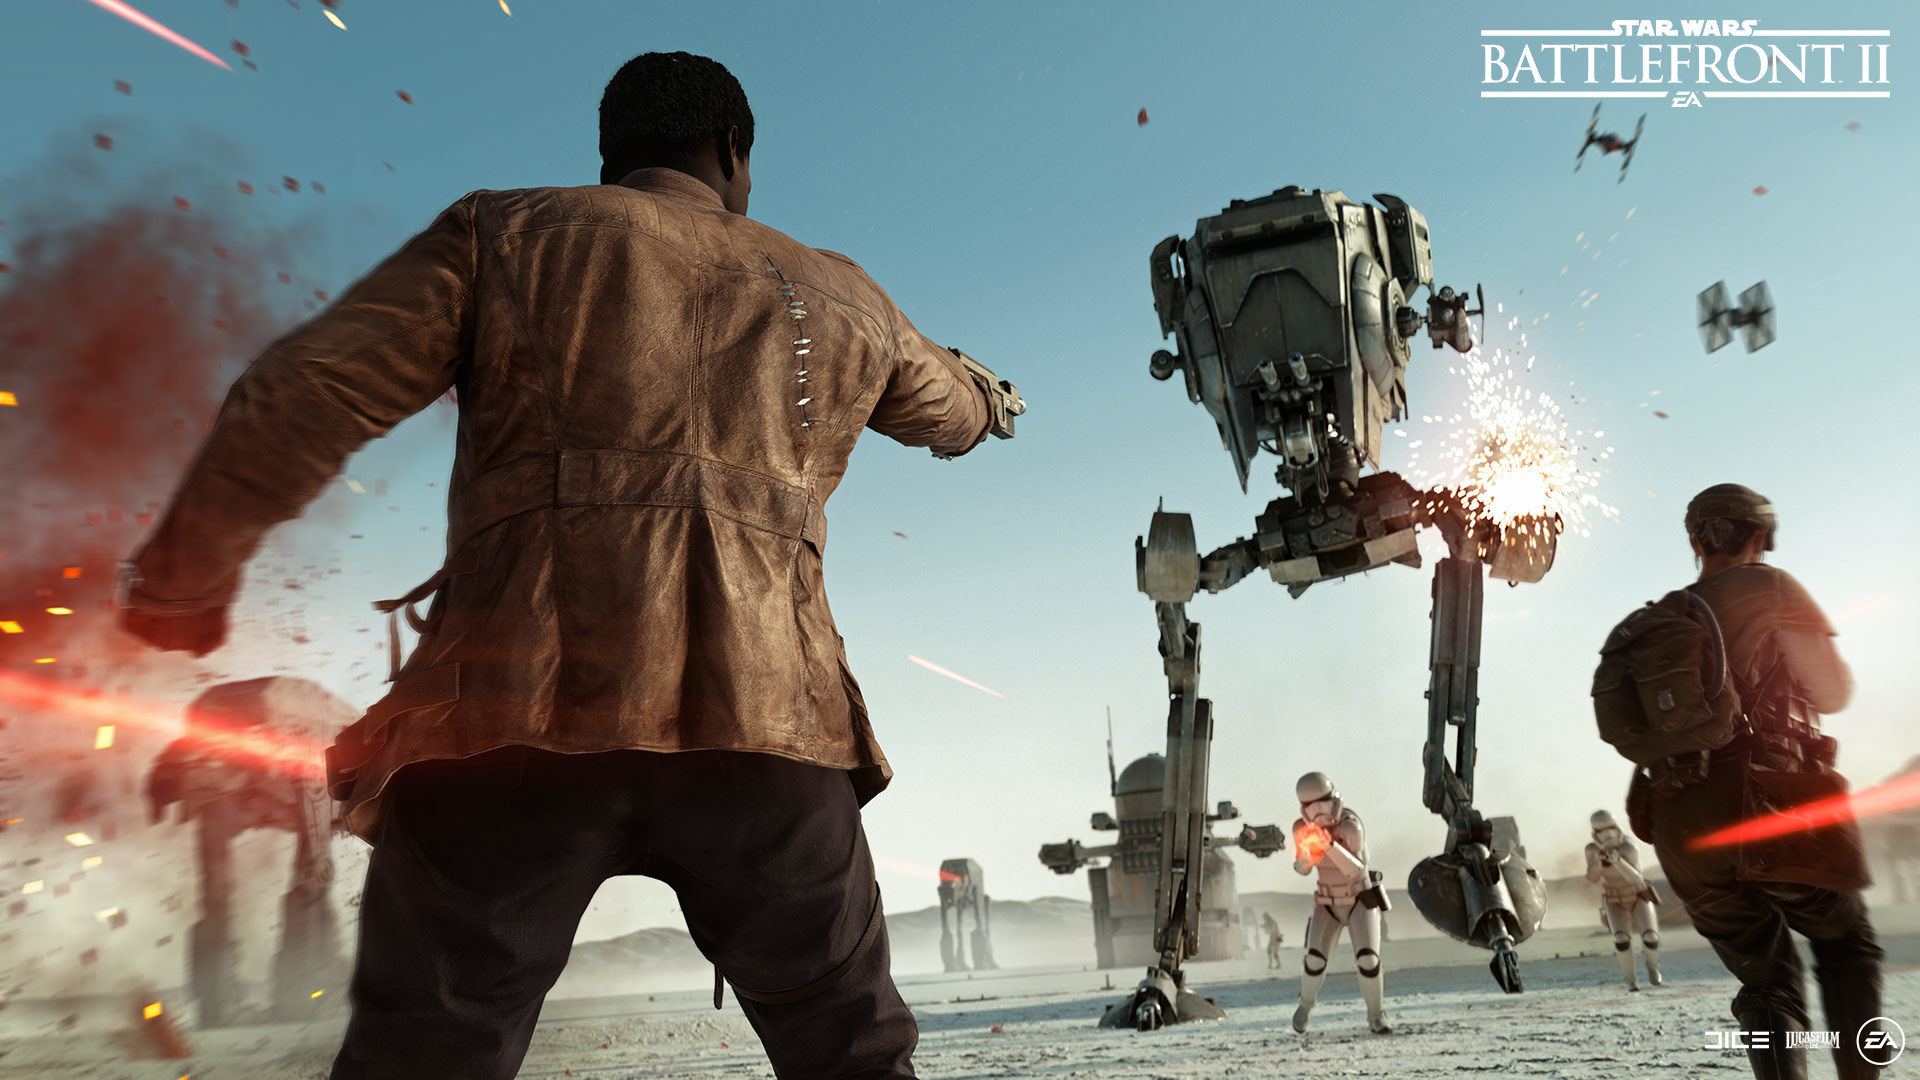 Finn Star Wars Battlefront II